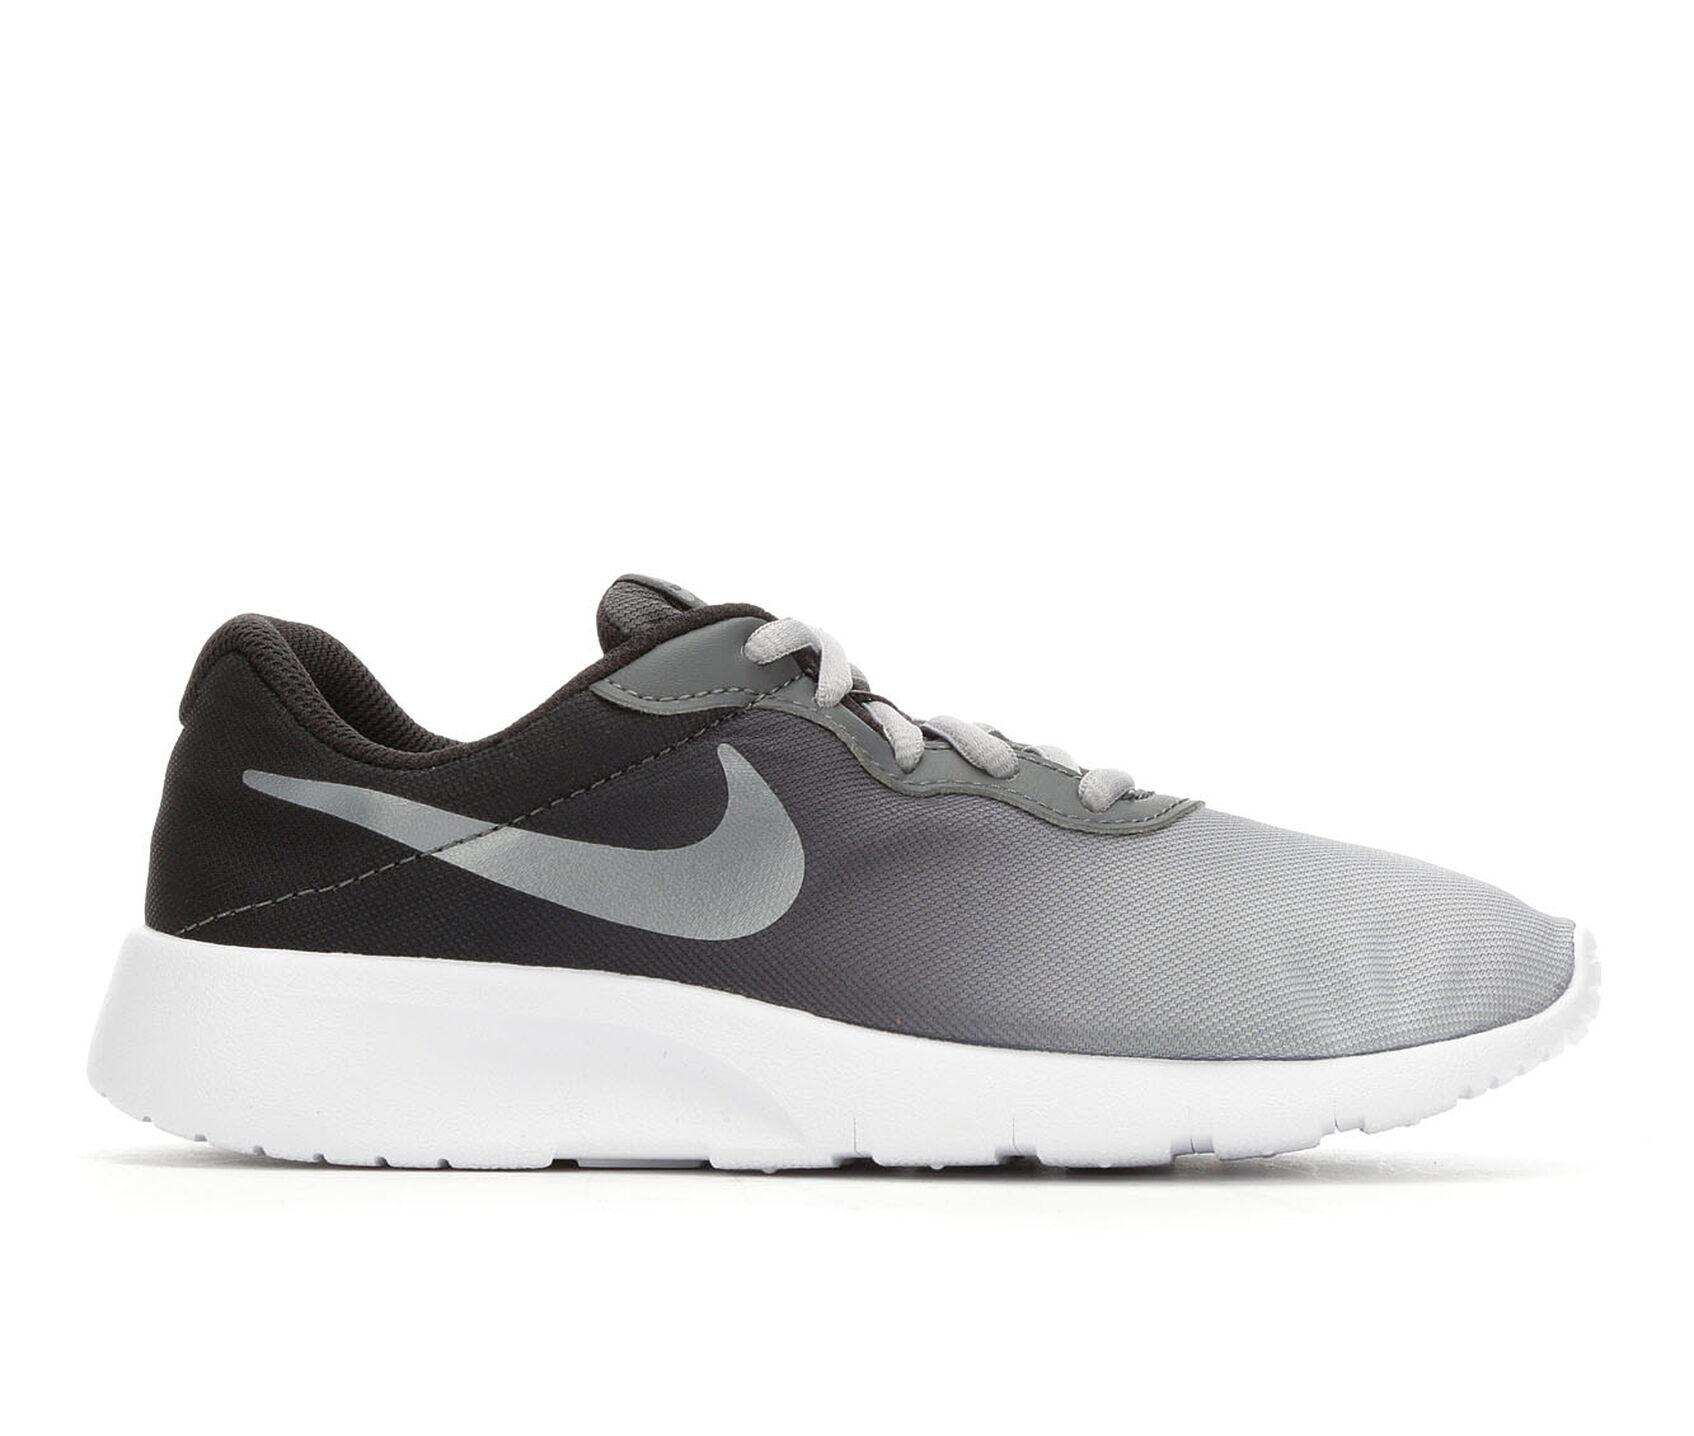 b362cd9d7f5806 ... Nike Little Kid Tanjun Fade Running Shoes. Previous